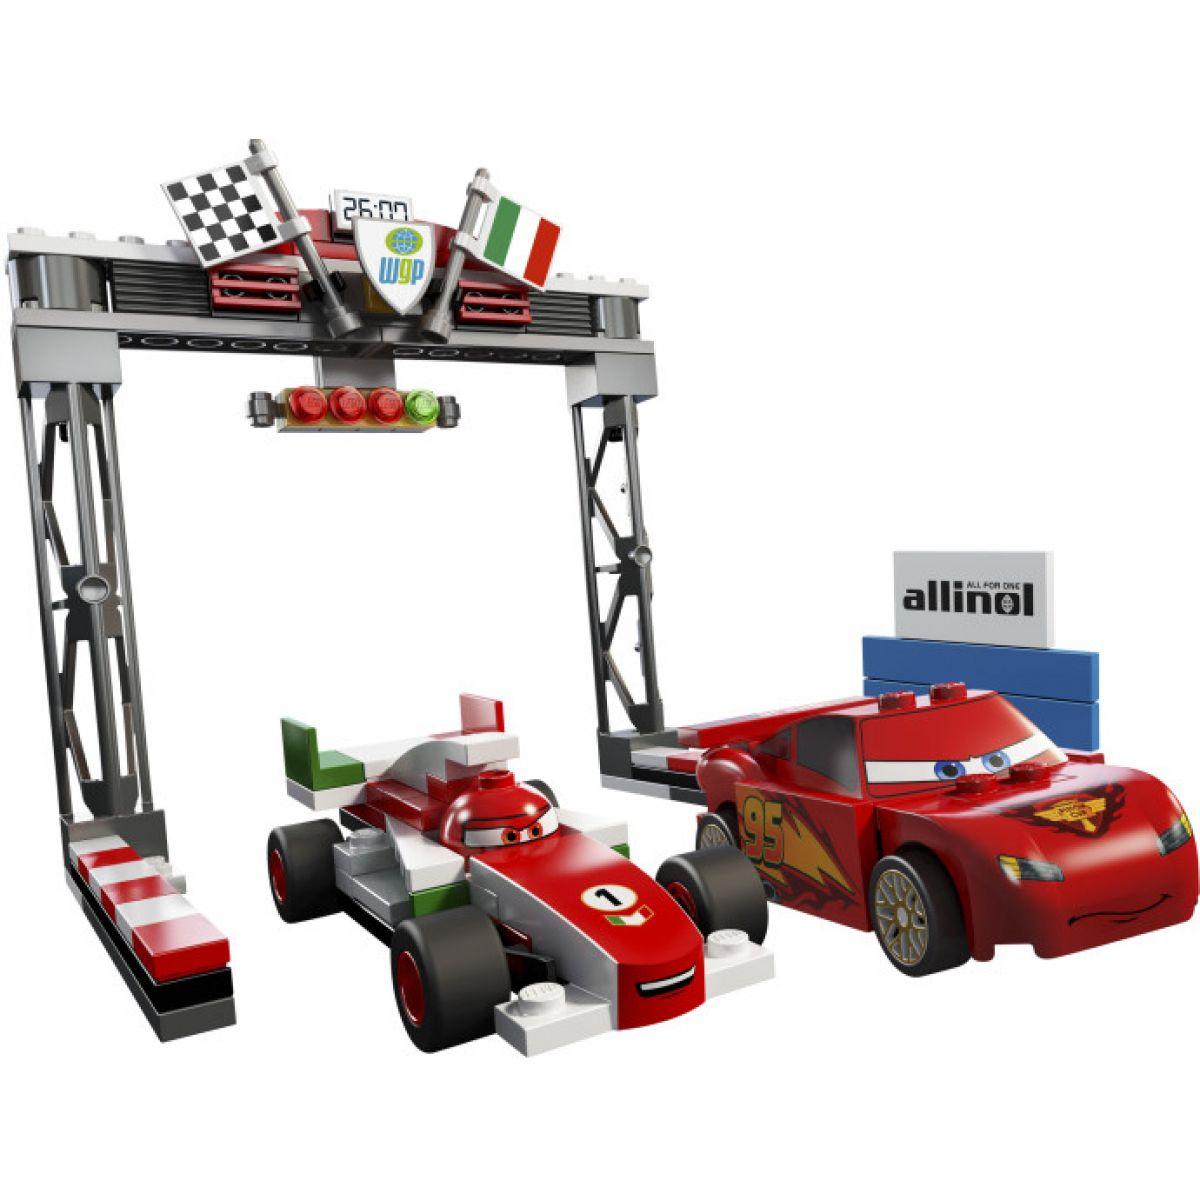 LEGO 8423 CARS World Grand Prix Racing Rivalry